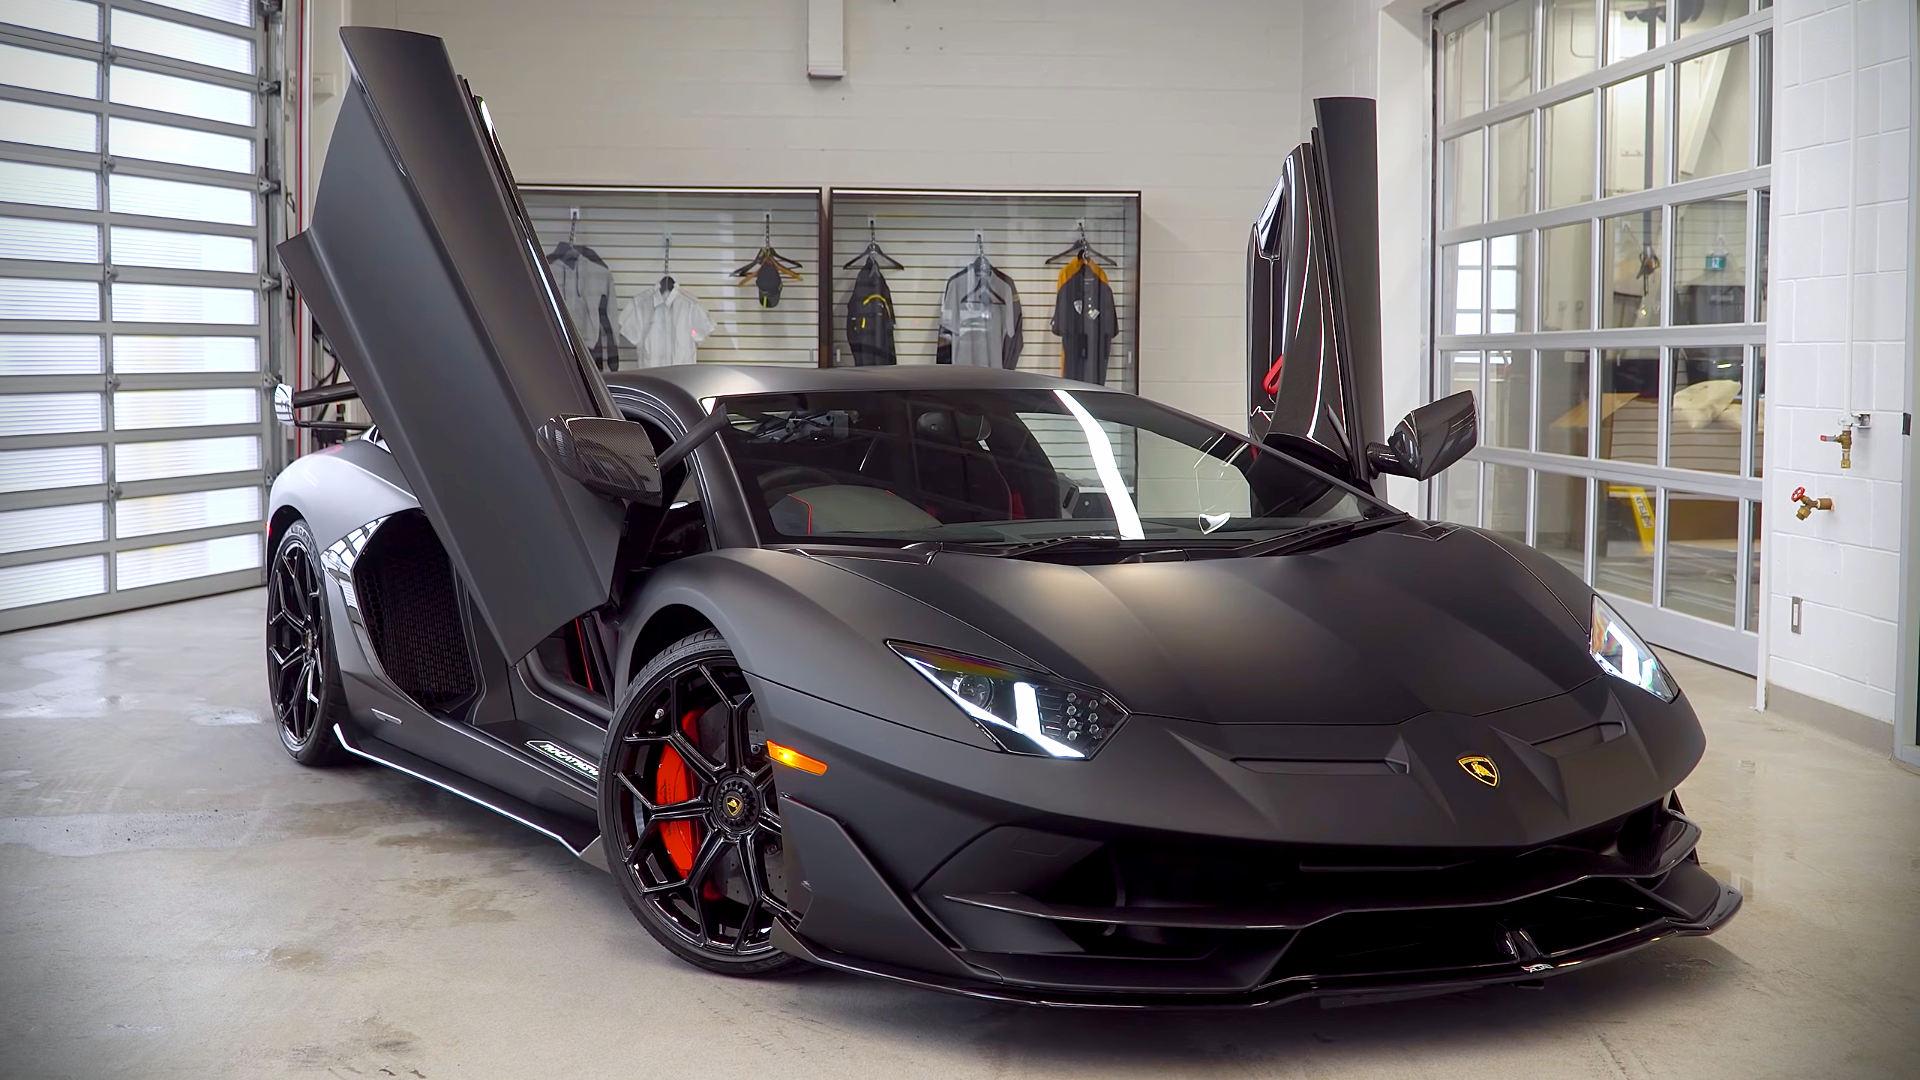 2019 Lamborghini Aventador SVJ Black